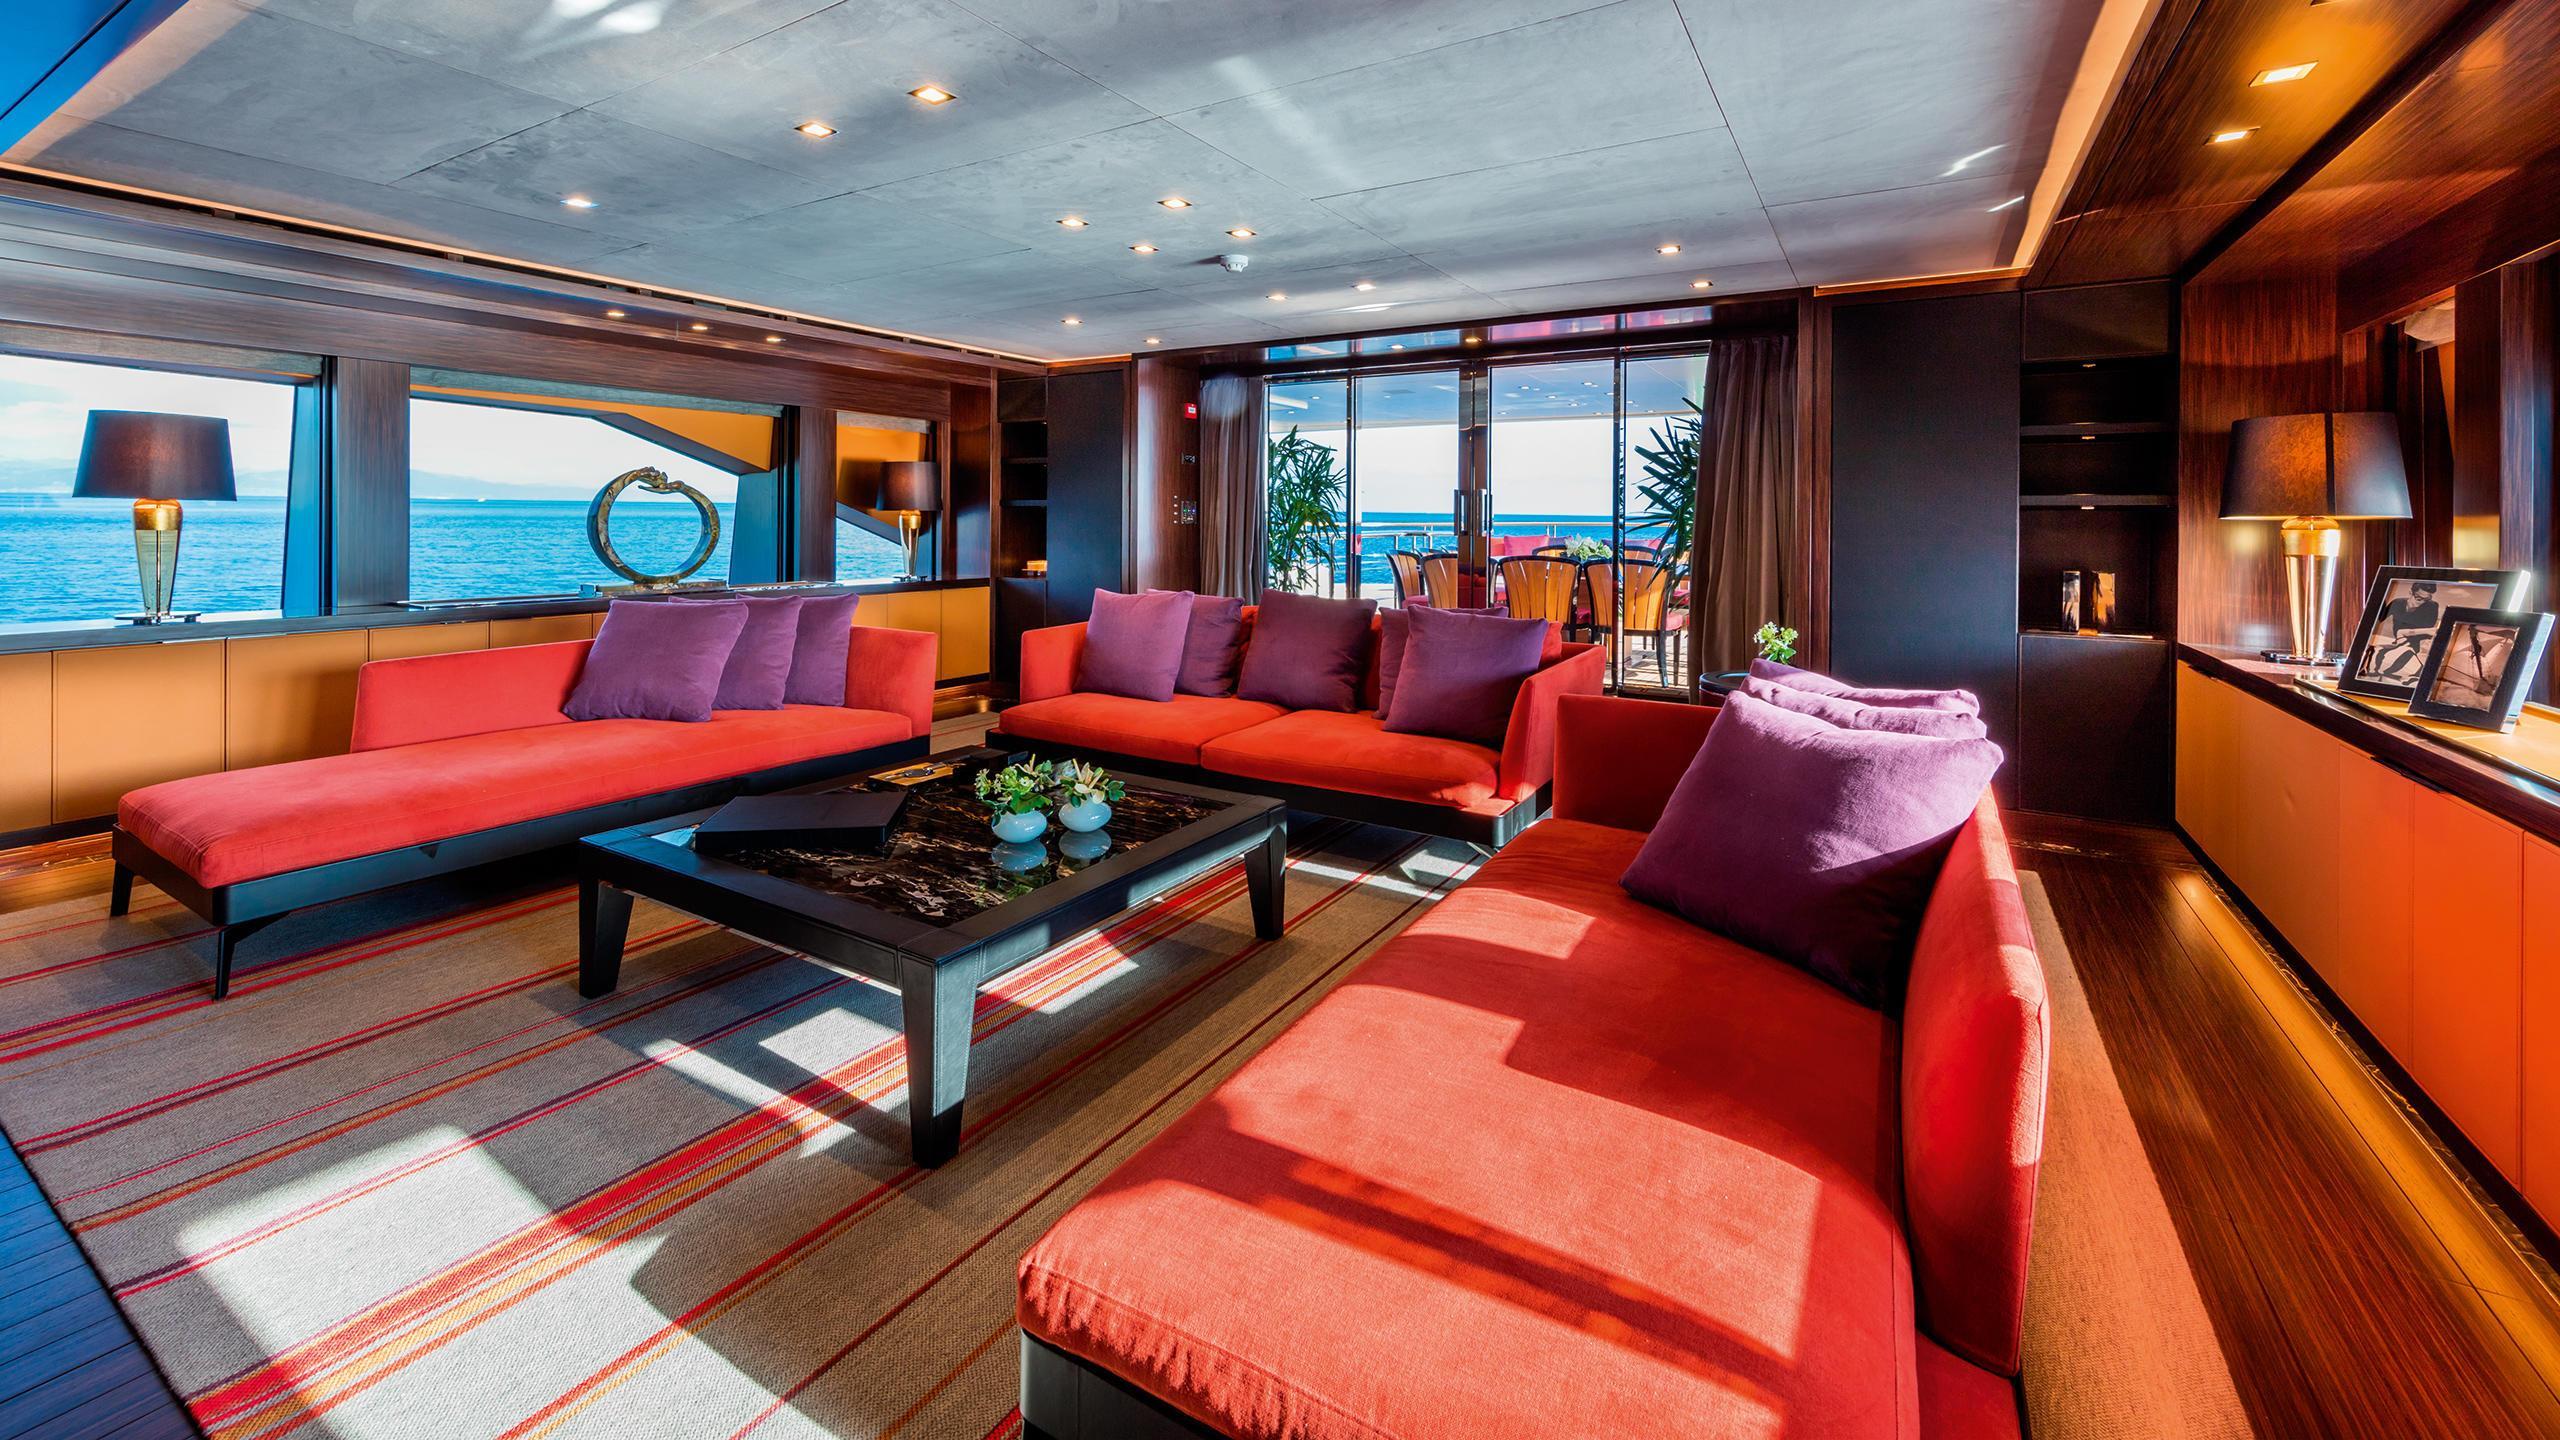 serenity-motor-yacht-mondomarine-2015-42m-red-saloon